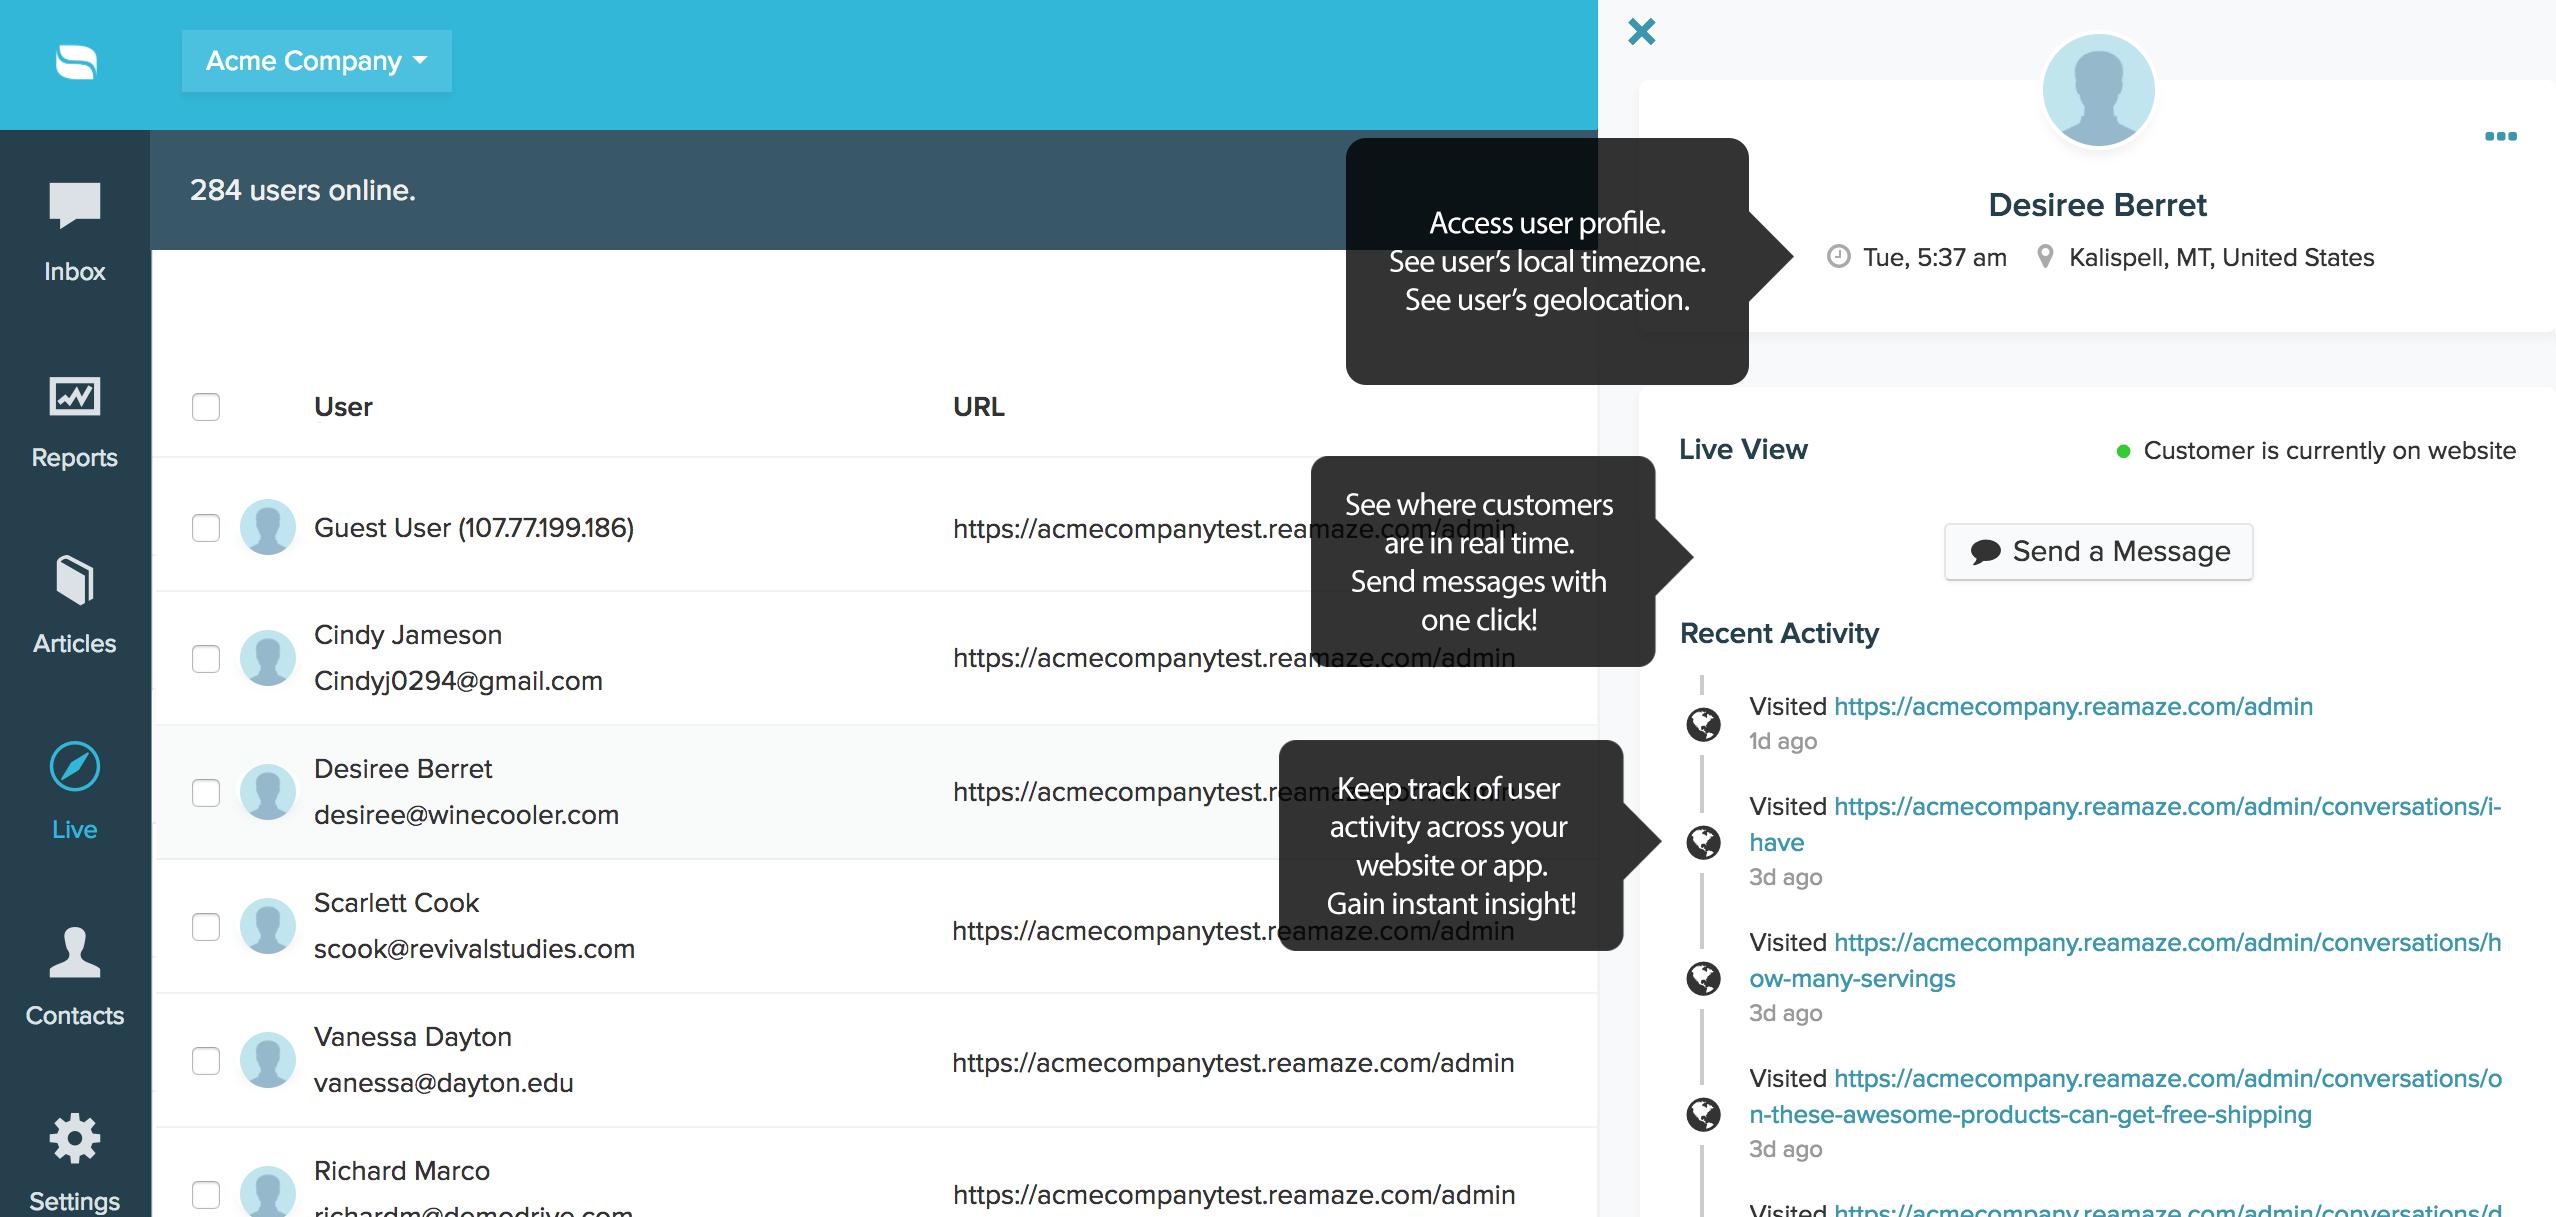 Reamaze Demo - Live Dashboard for Customer Monitoring